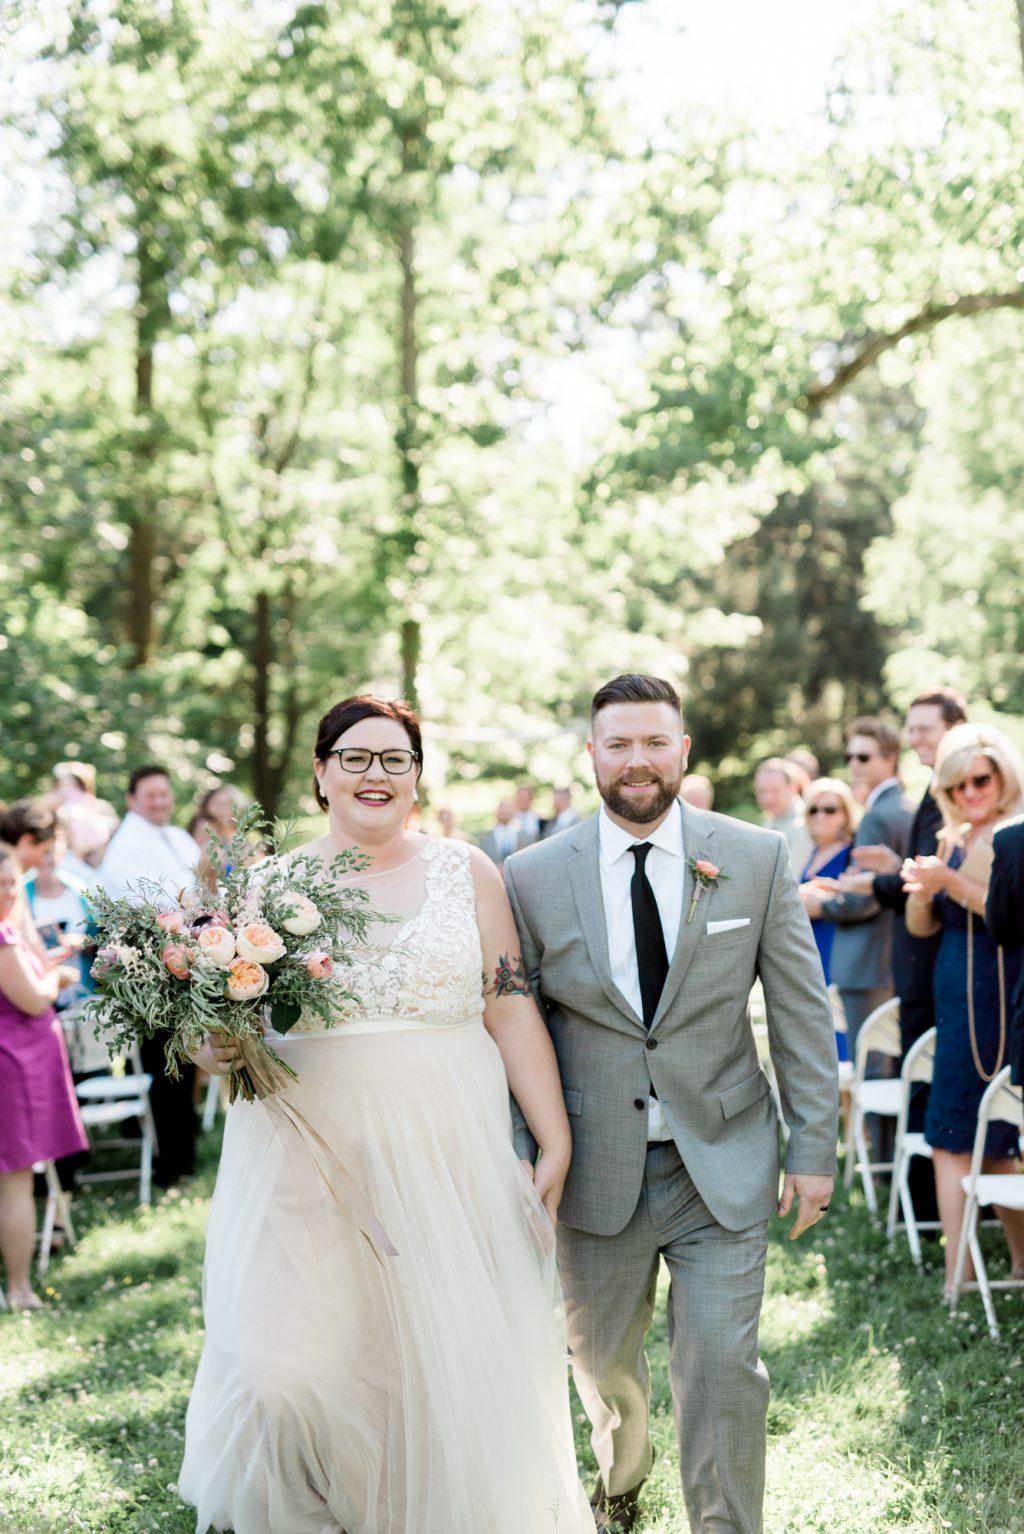 haley-richter-photo-west-chester-summer-wedding-boxcar-brewery-129